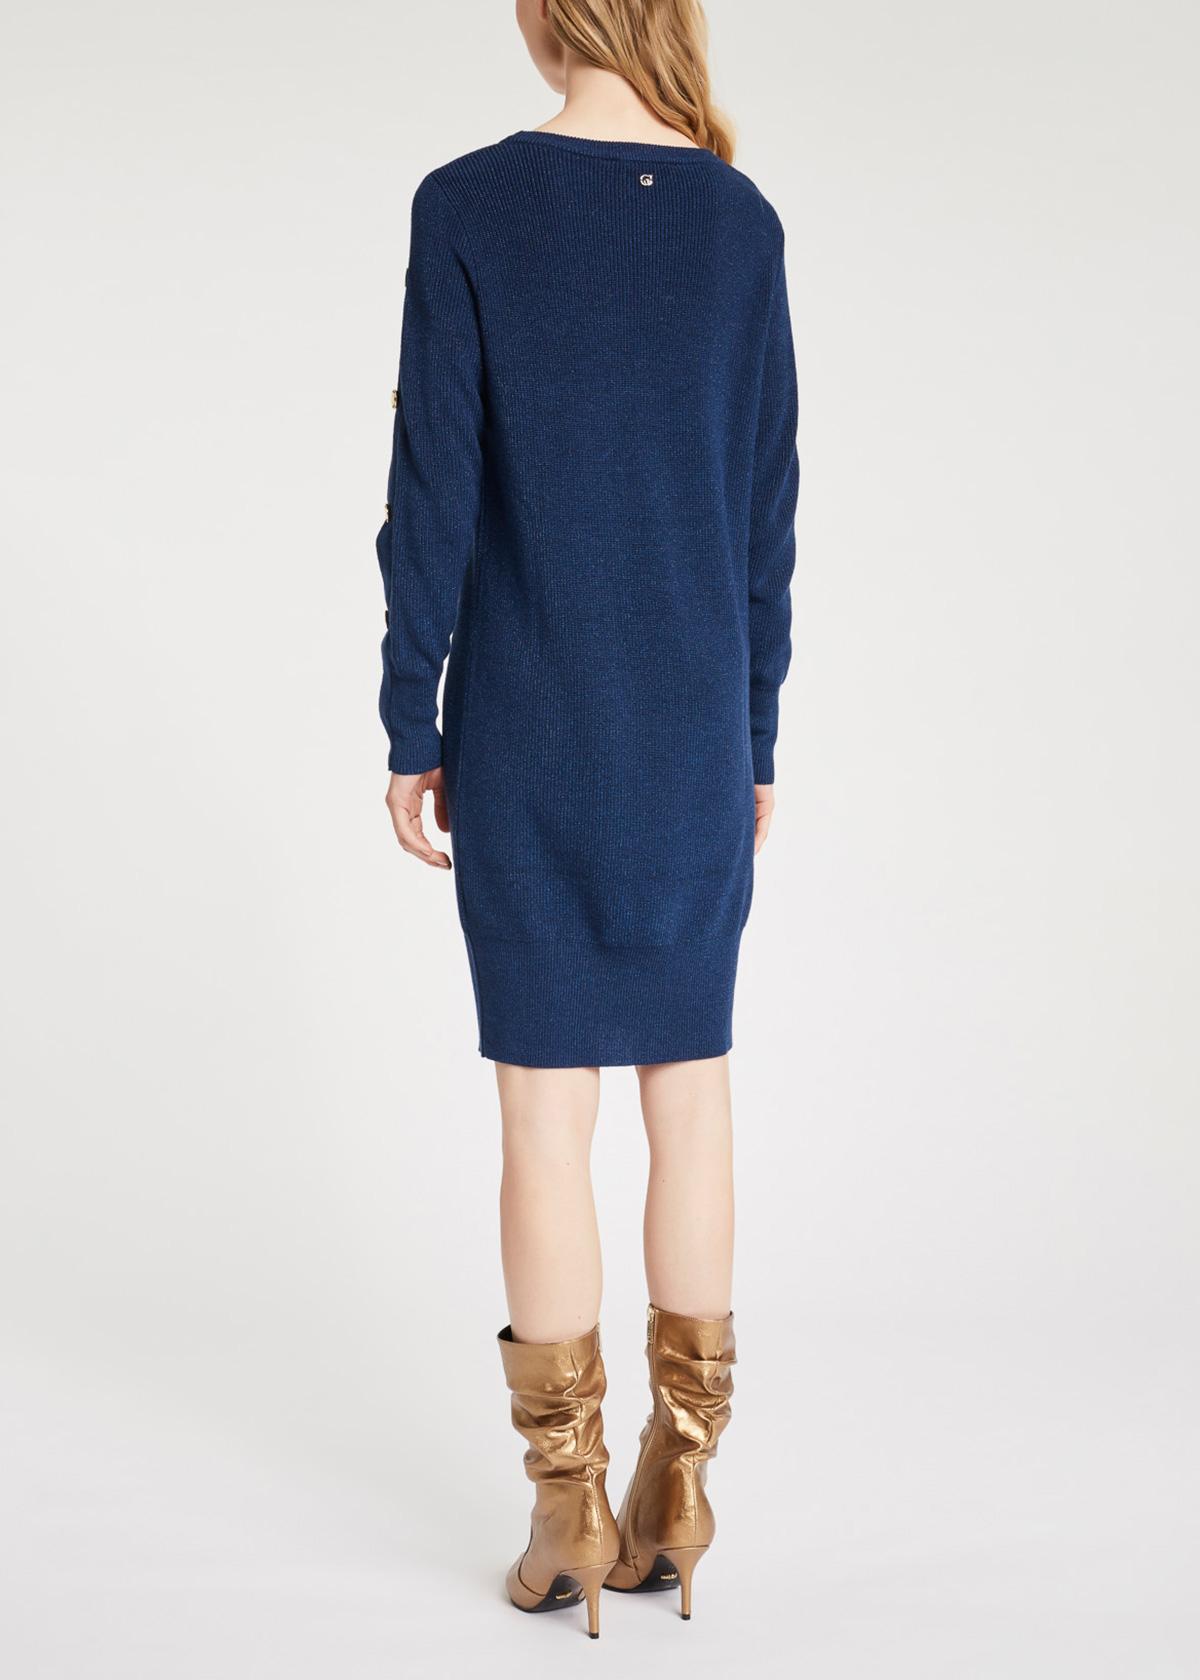 Wool dress neckline GAUDI |  | BD130042891